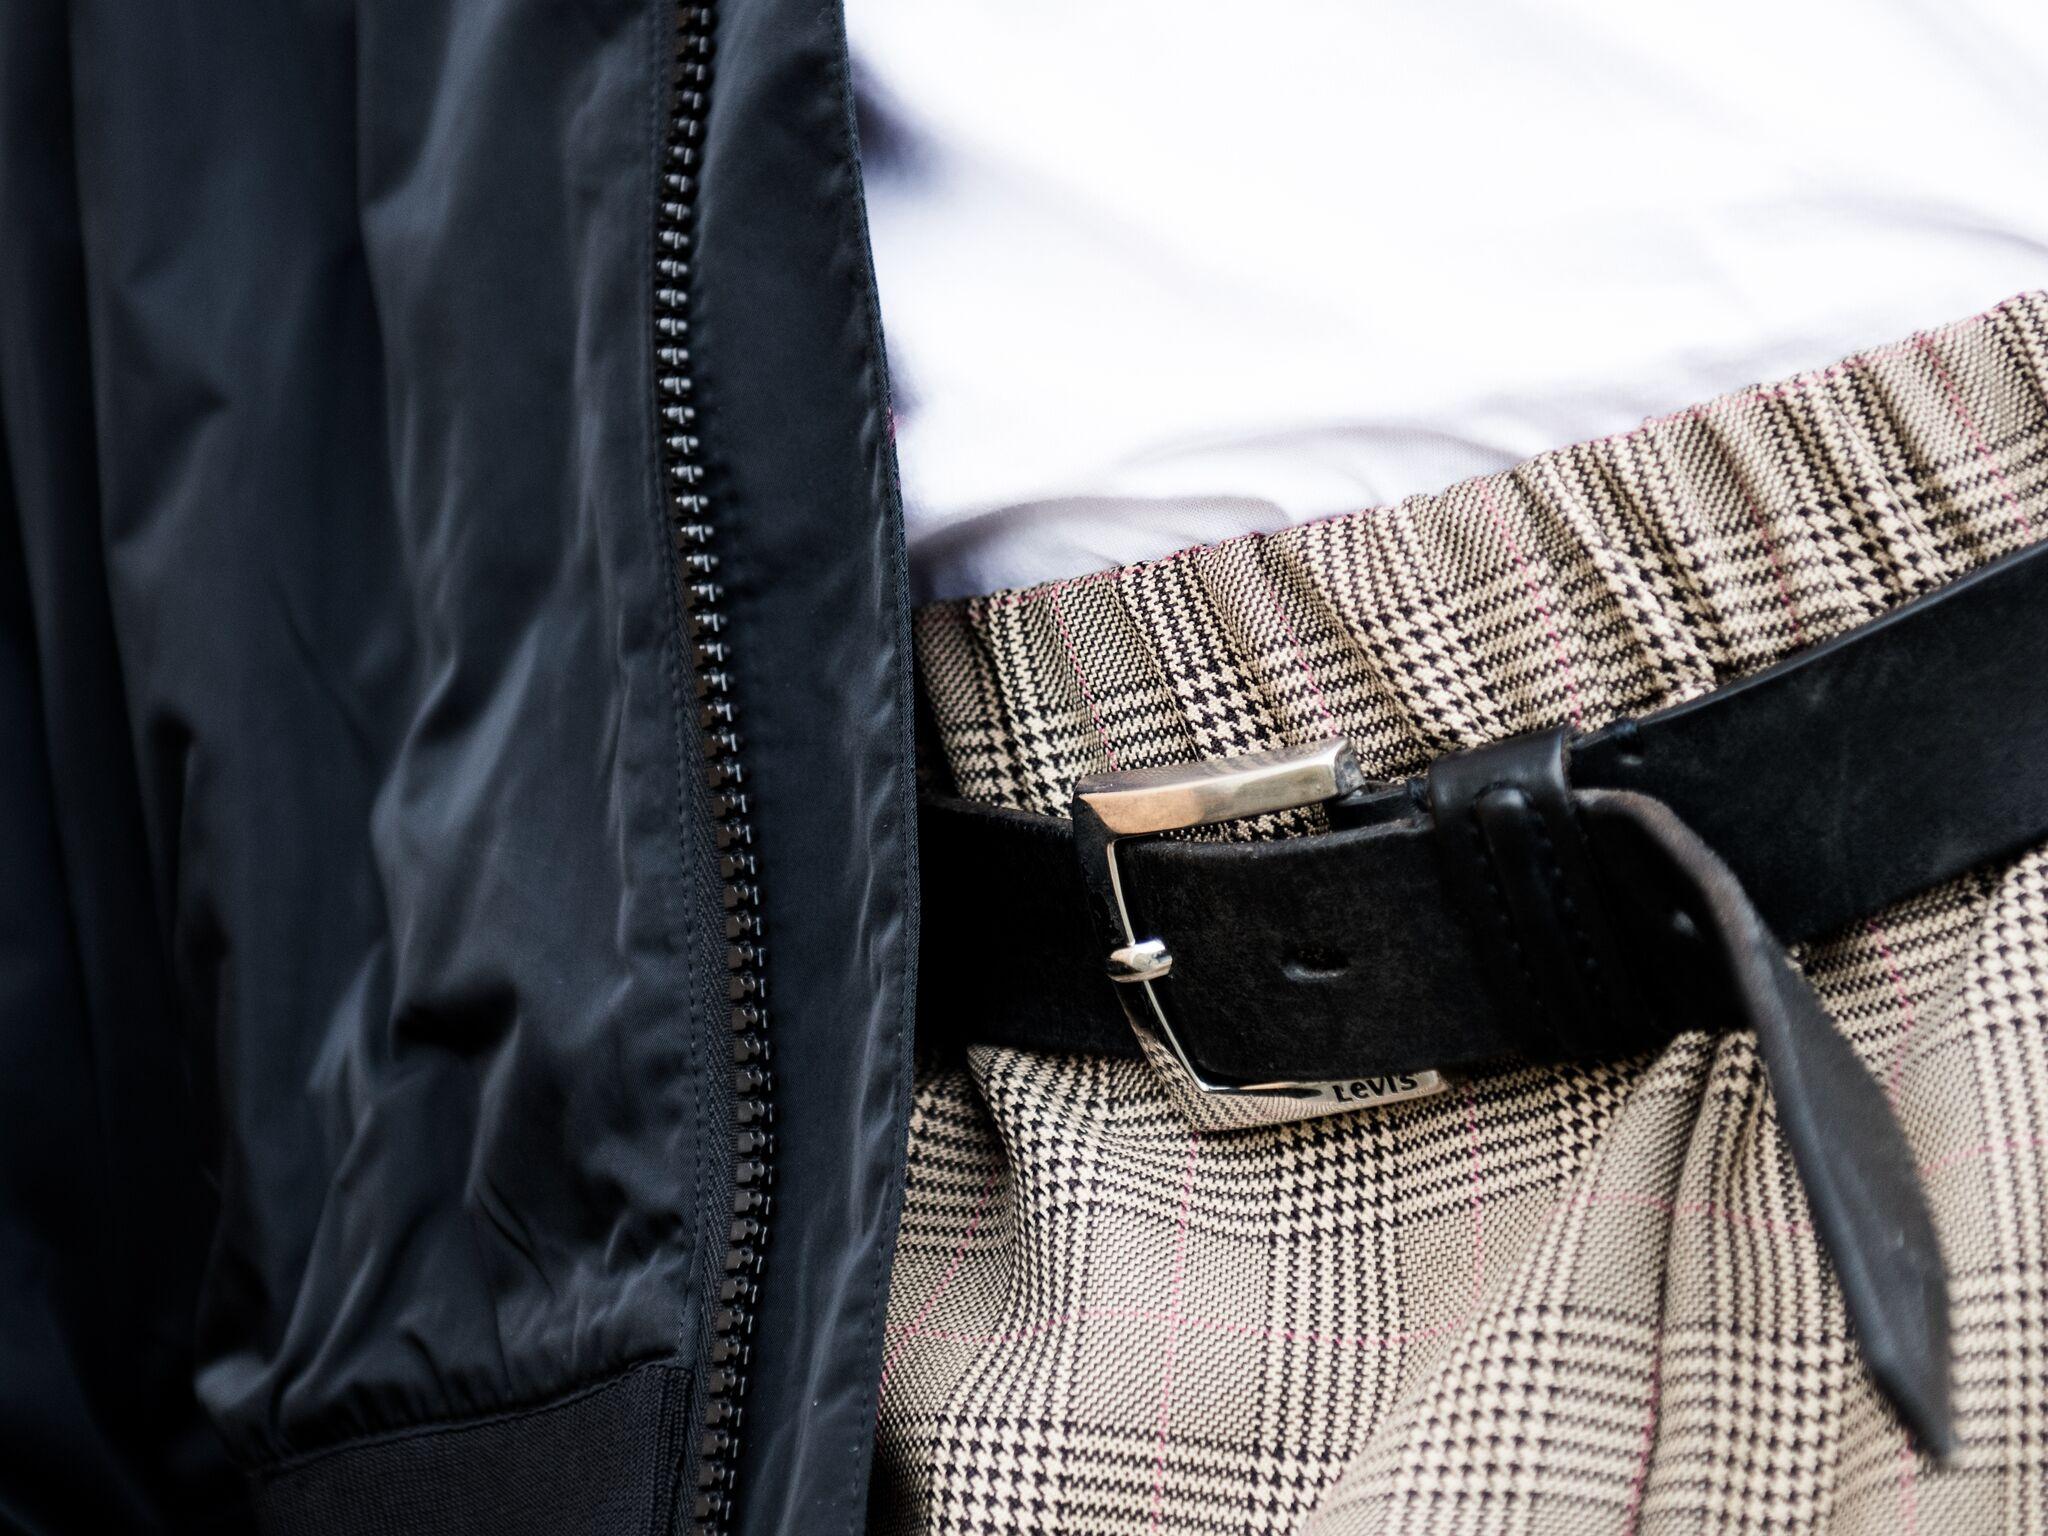 Bomber jacket Cheap Monday, Shirt American Apparel, Belt Levi's, Pants Reclaimed Vintage